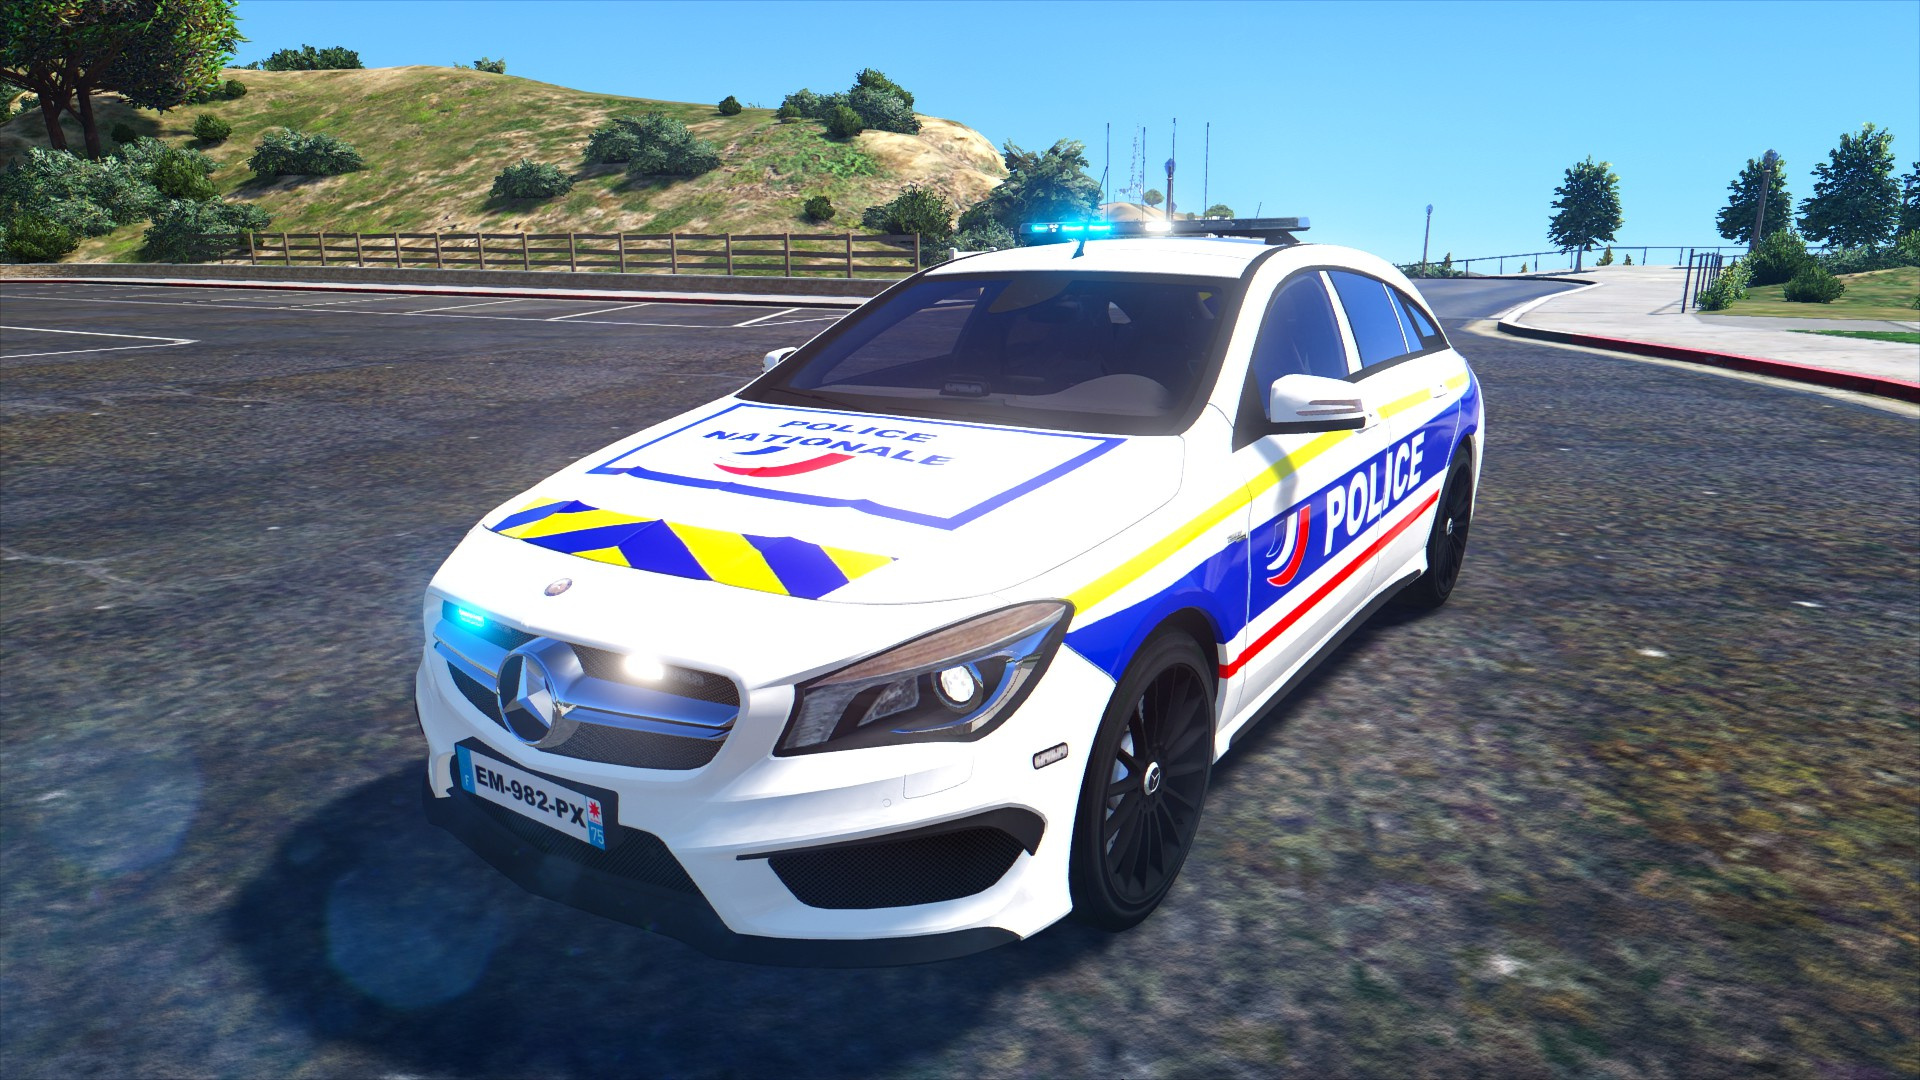 Mercedes Benz Police Nationale Gta5 Mods Com